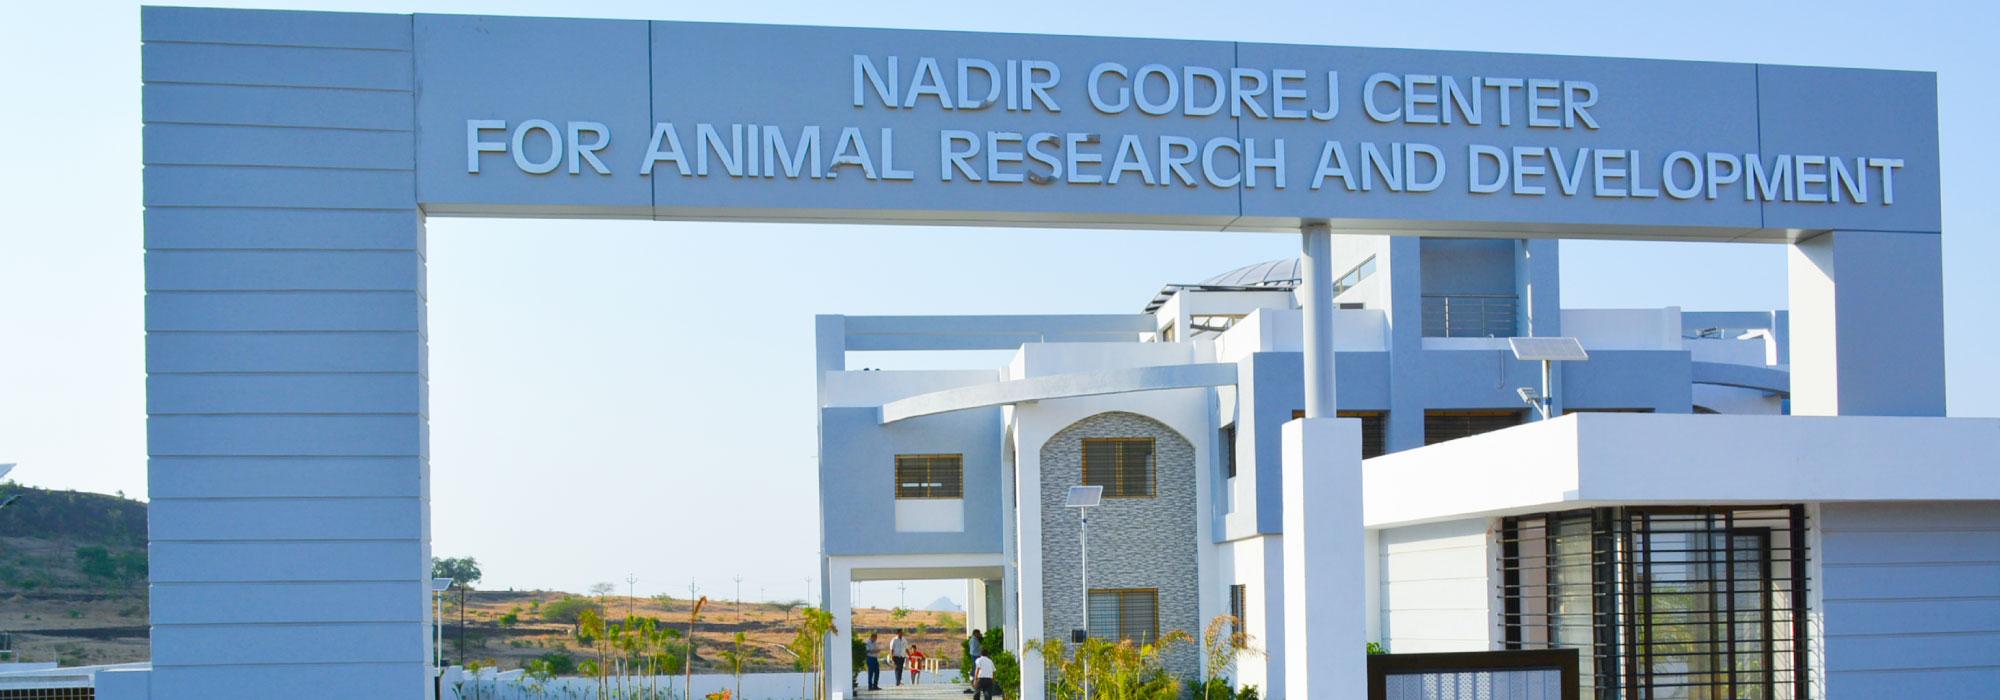 Nadir Godrej Center for Animal R&D